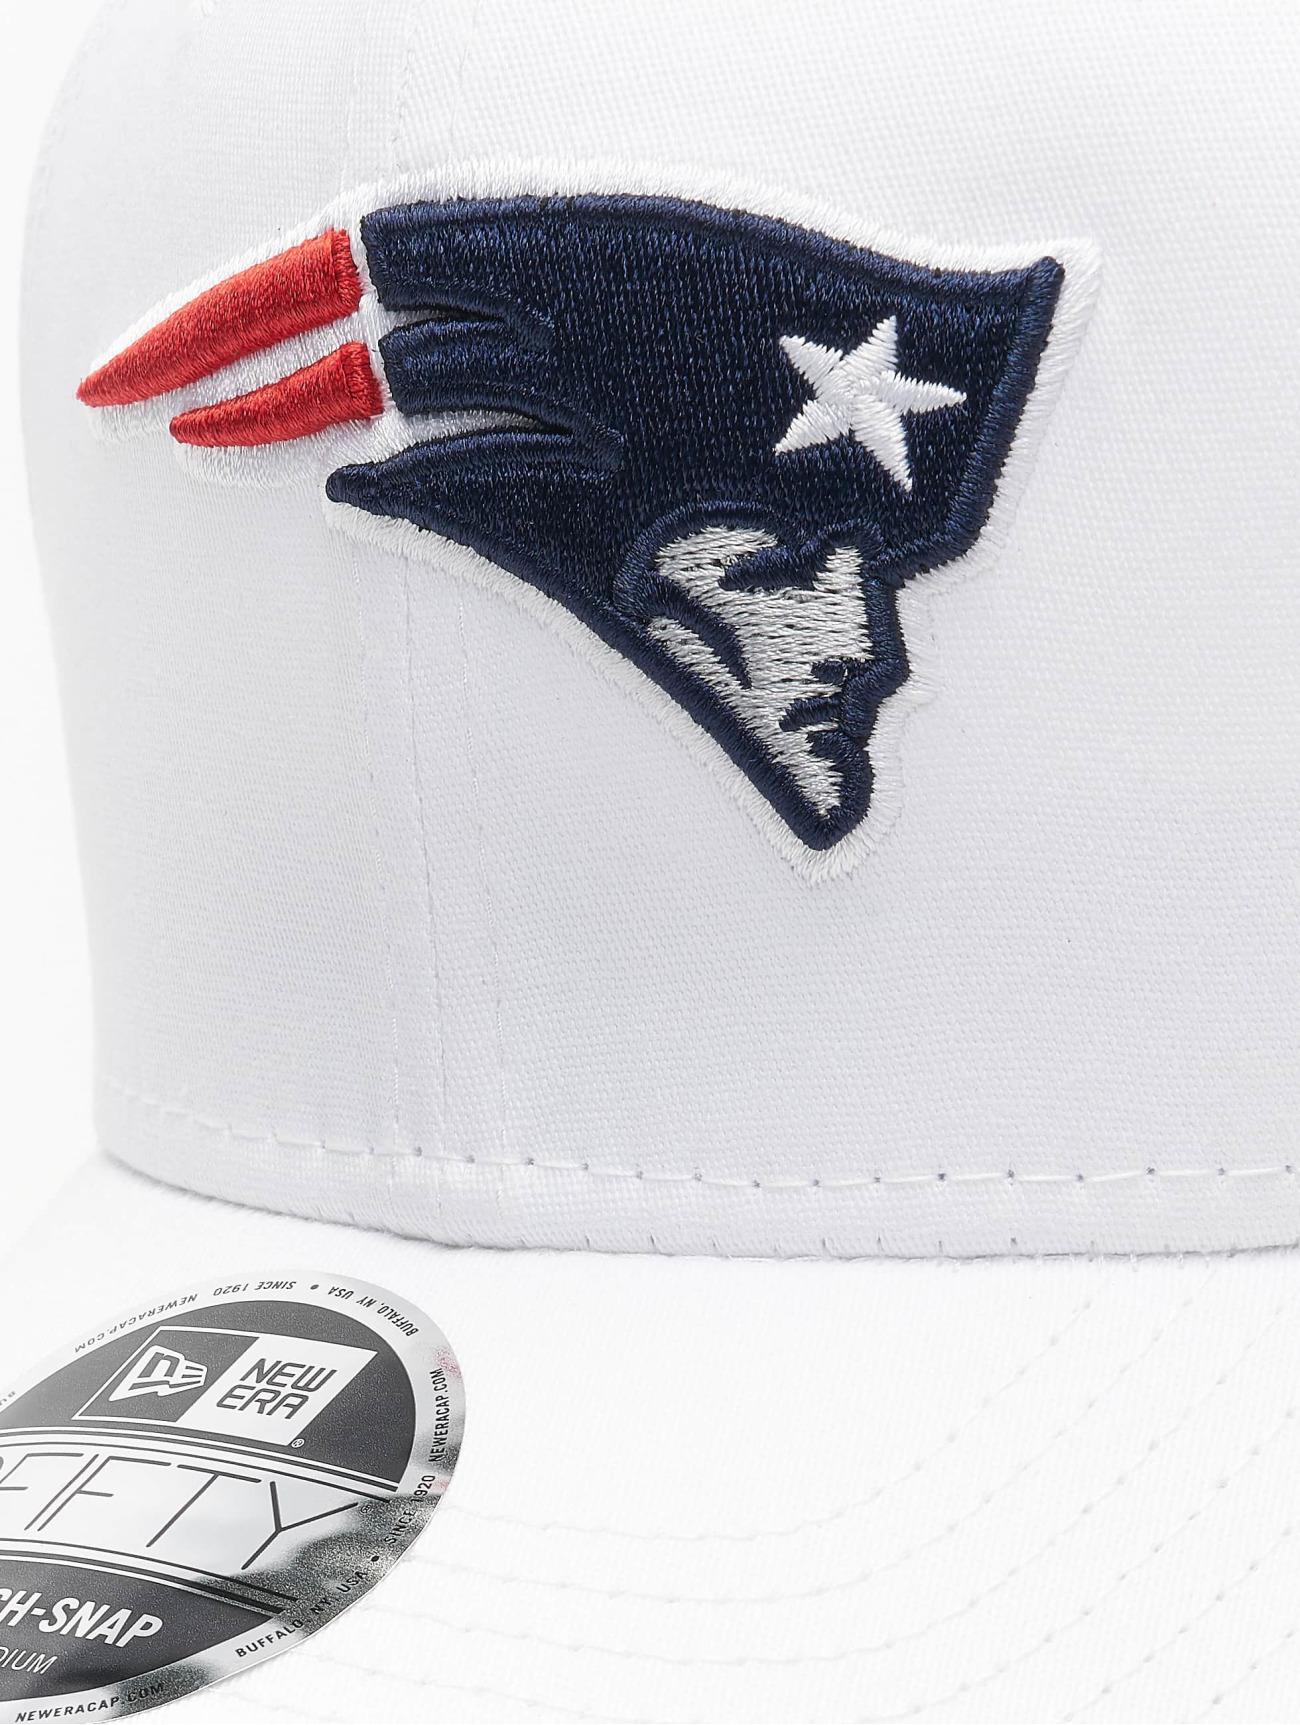 New Era  NFL New England Patriots White Base  blanc  Casquette Snapback & Strapback  755310 Homme Casquettes